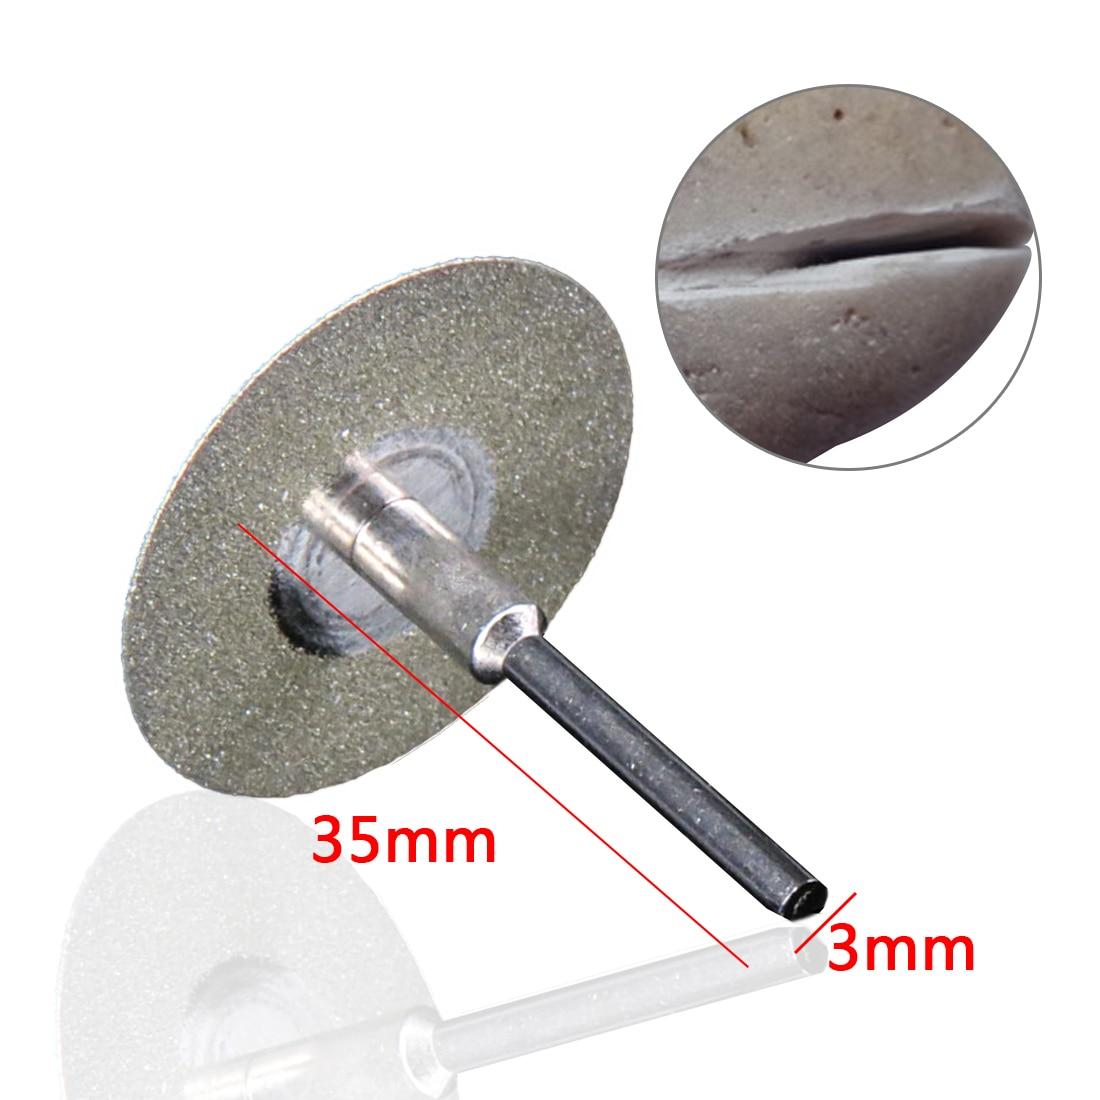 Mini disco de corte Dremel, muela abrasiva de diamante giratoria, - Herramientas abrasivas - foto 4